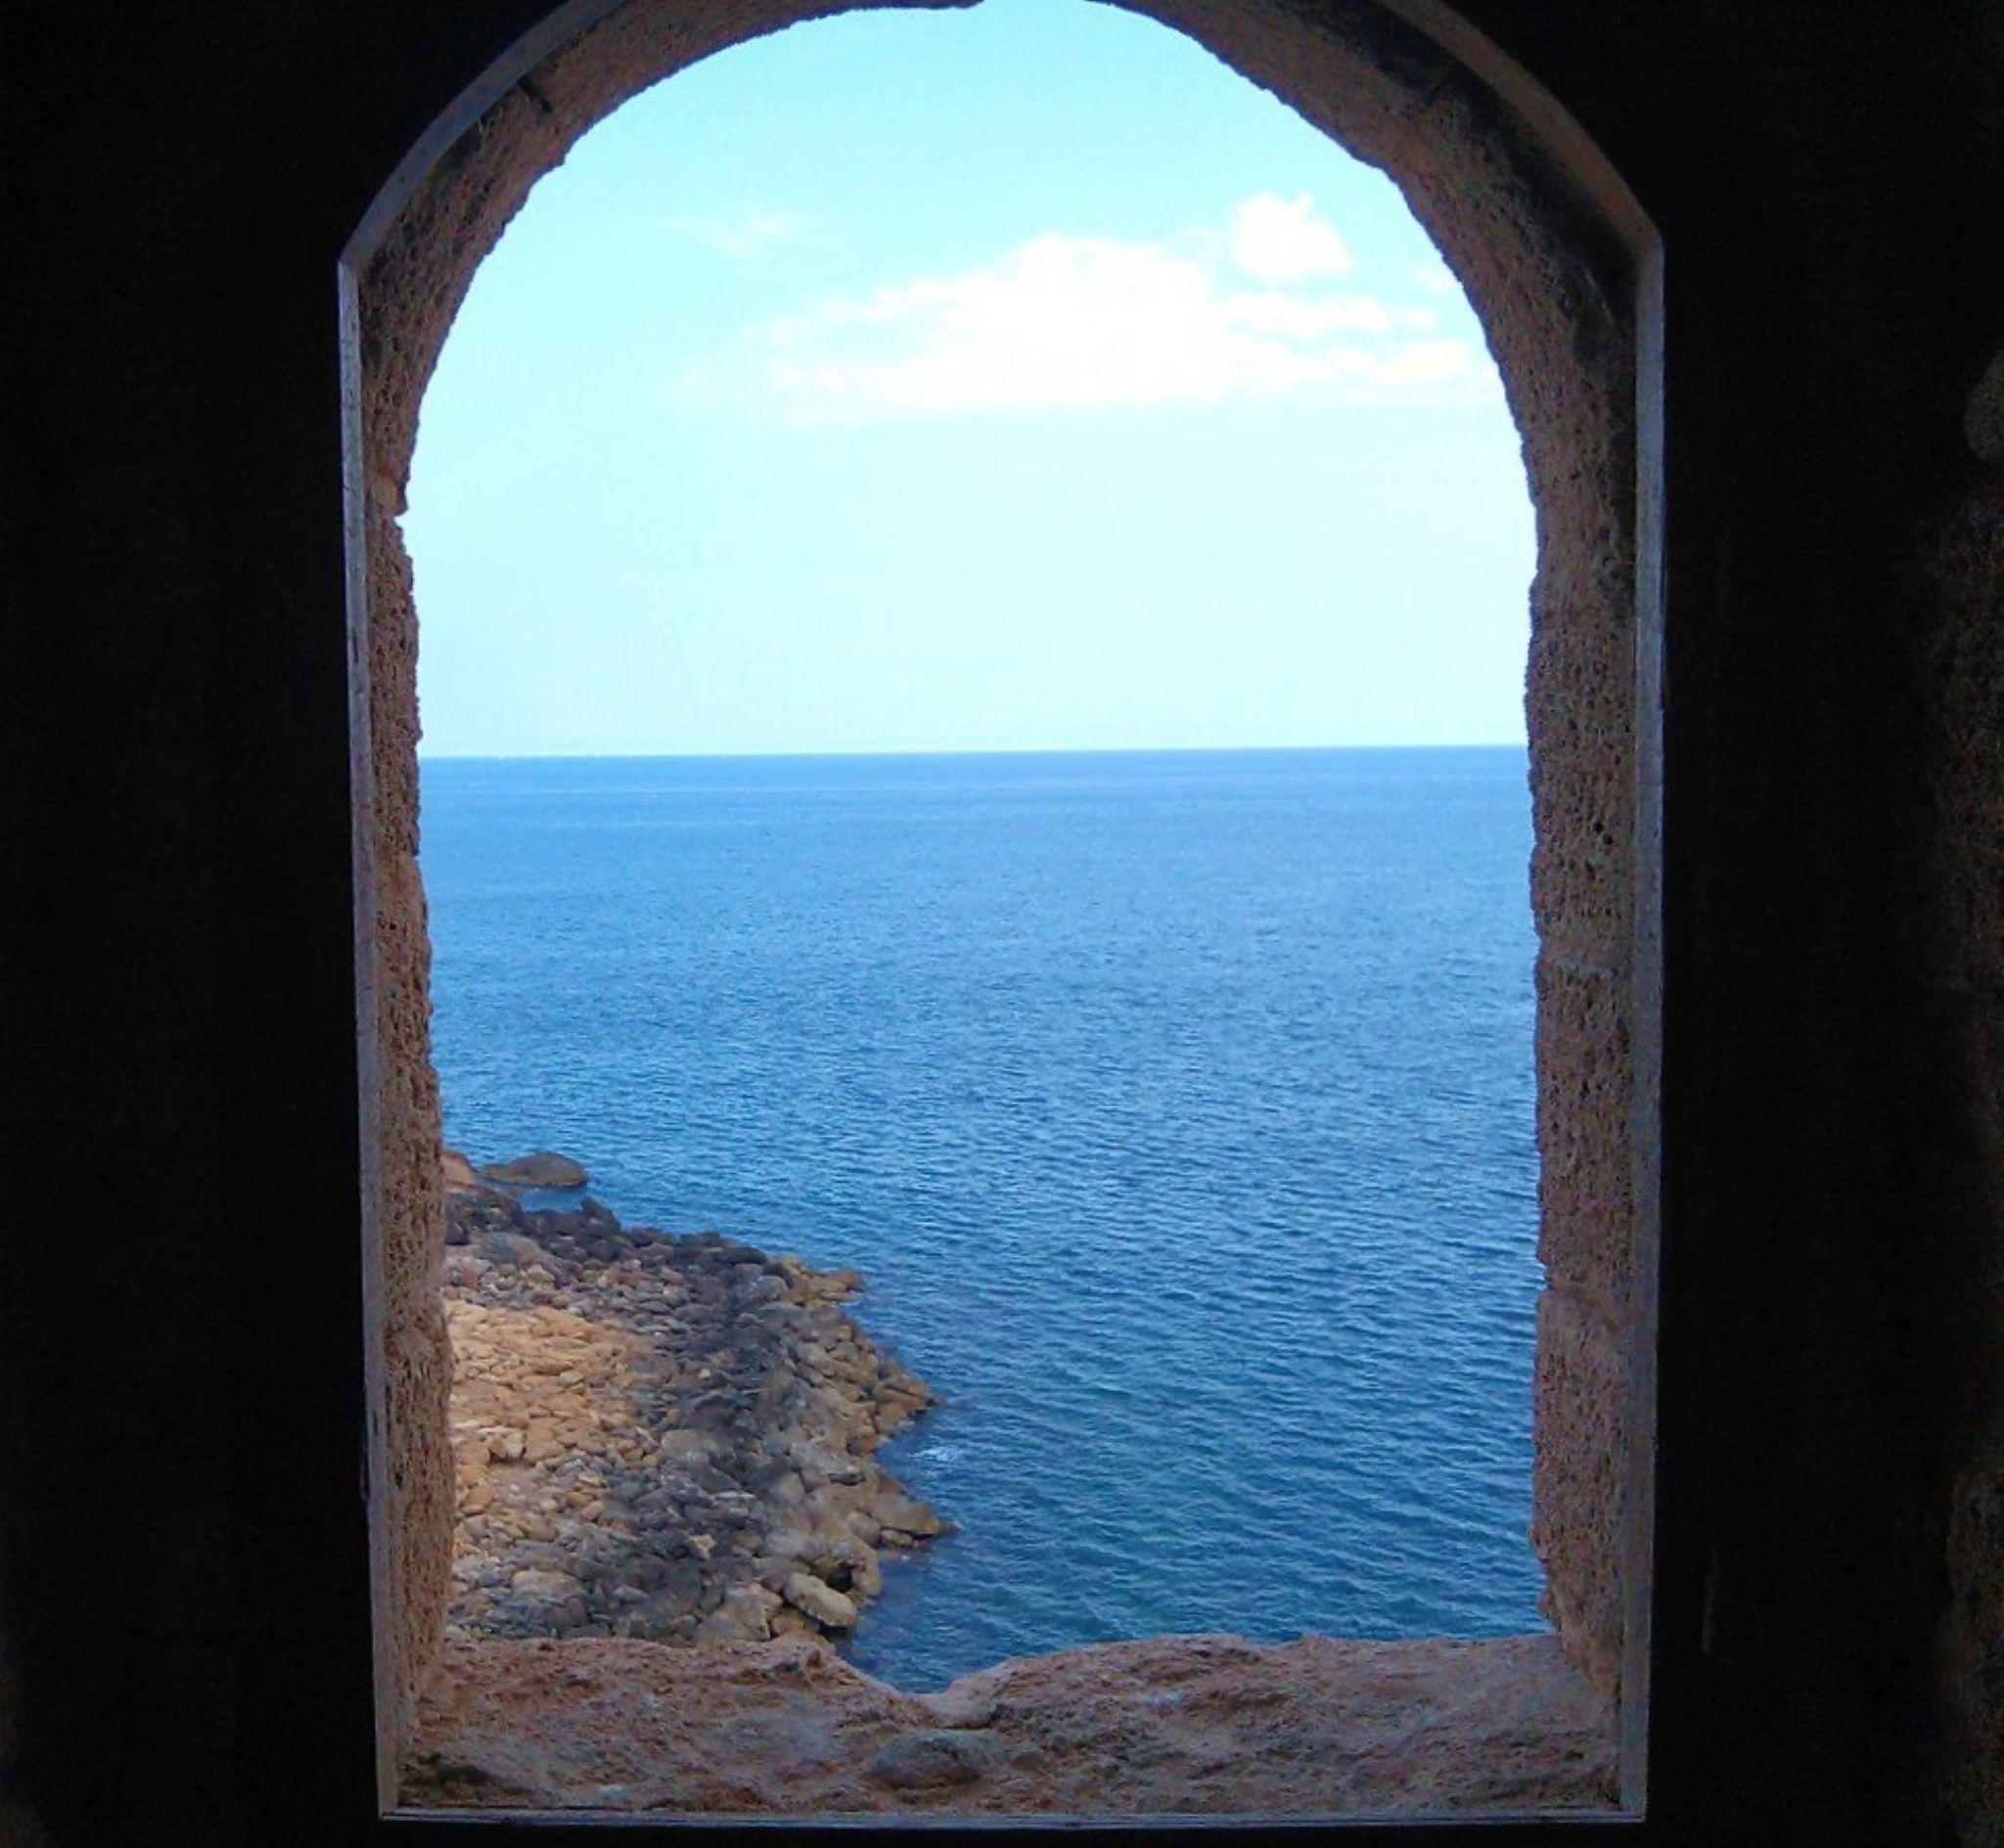 View from Le Castelle by Raffaele Tria